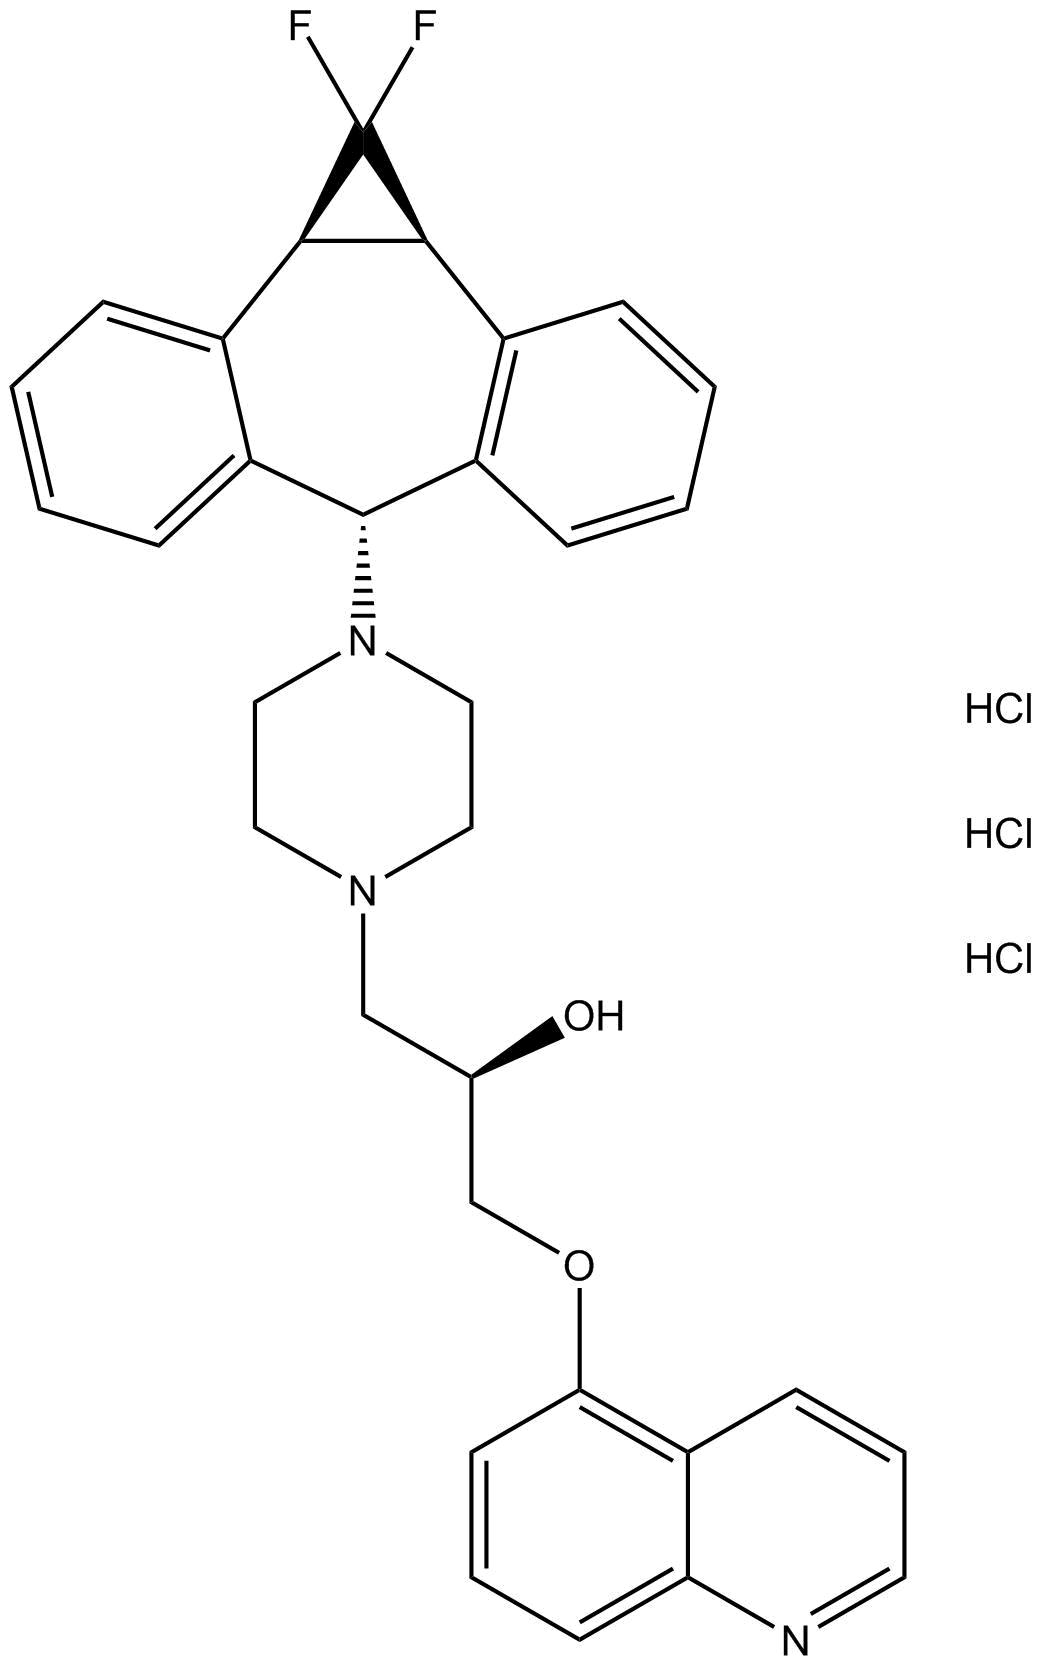 LY335979(Zosuquidar 3HCI)